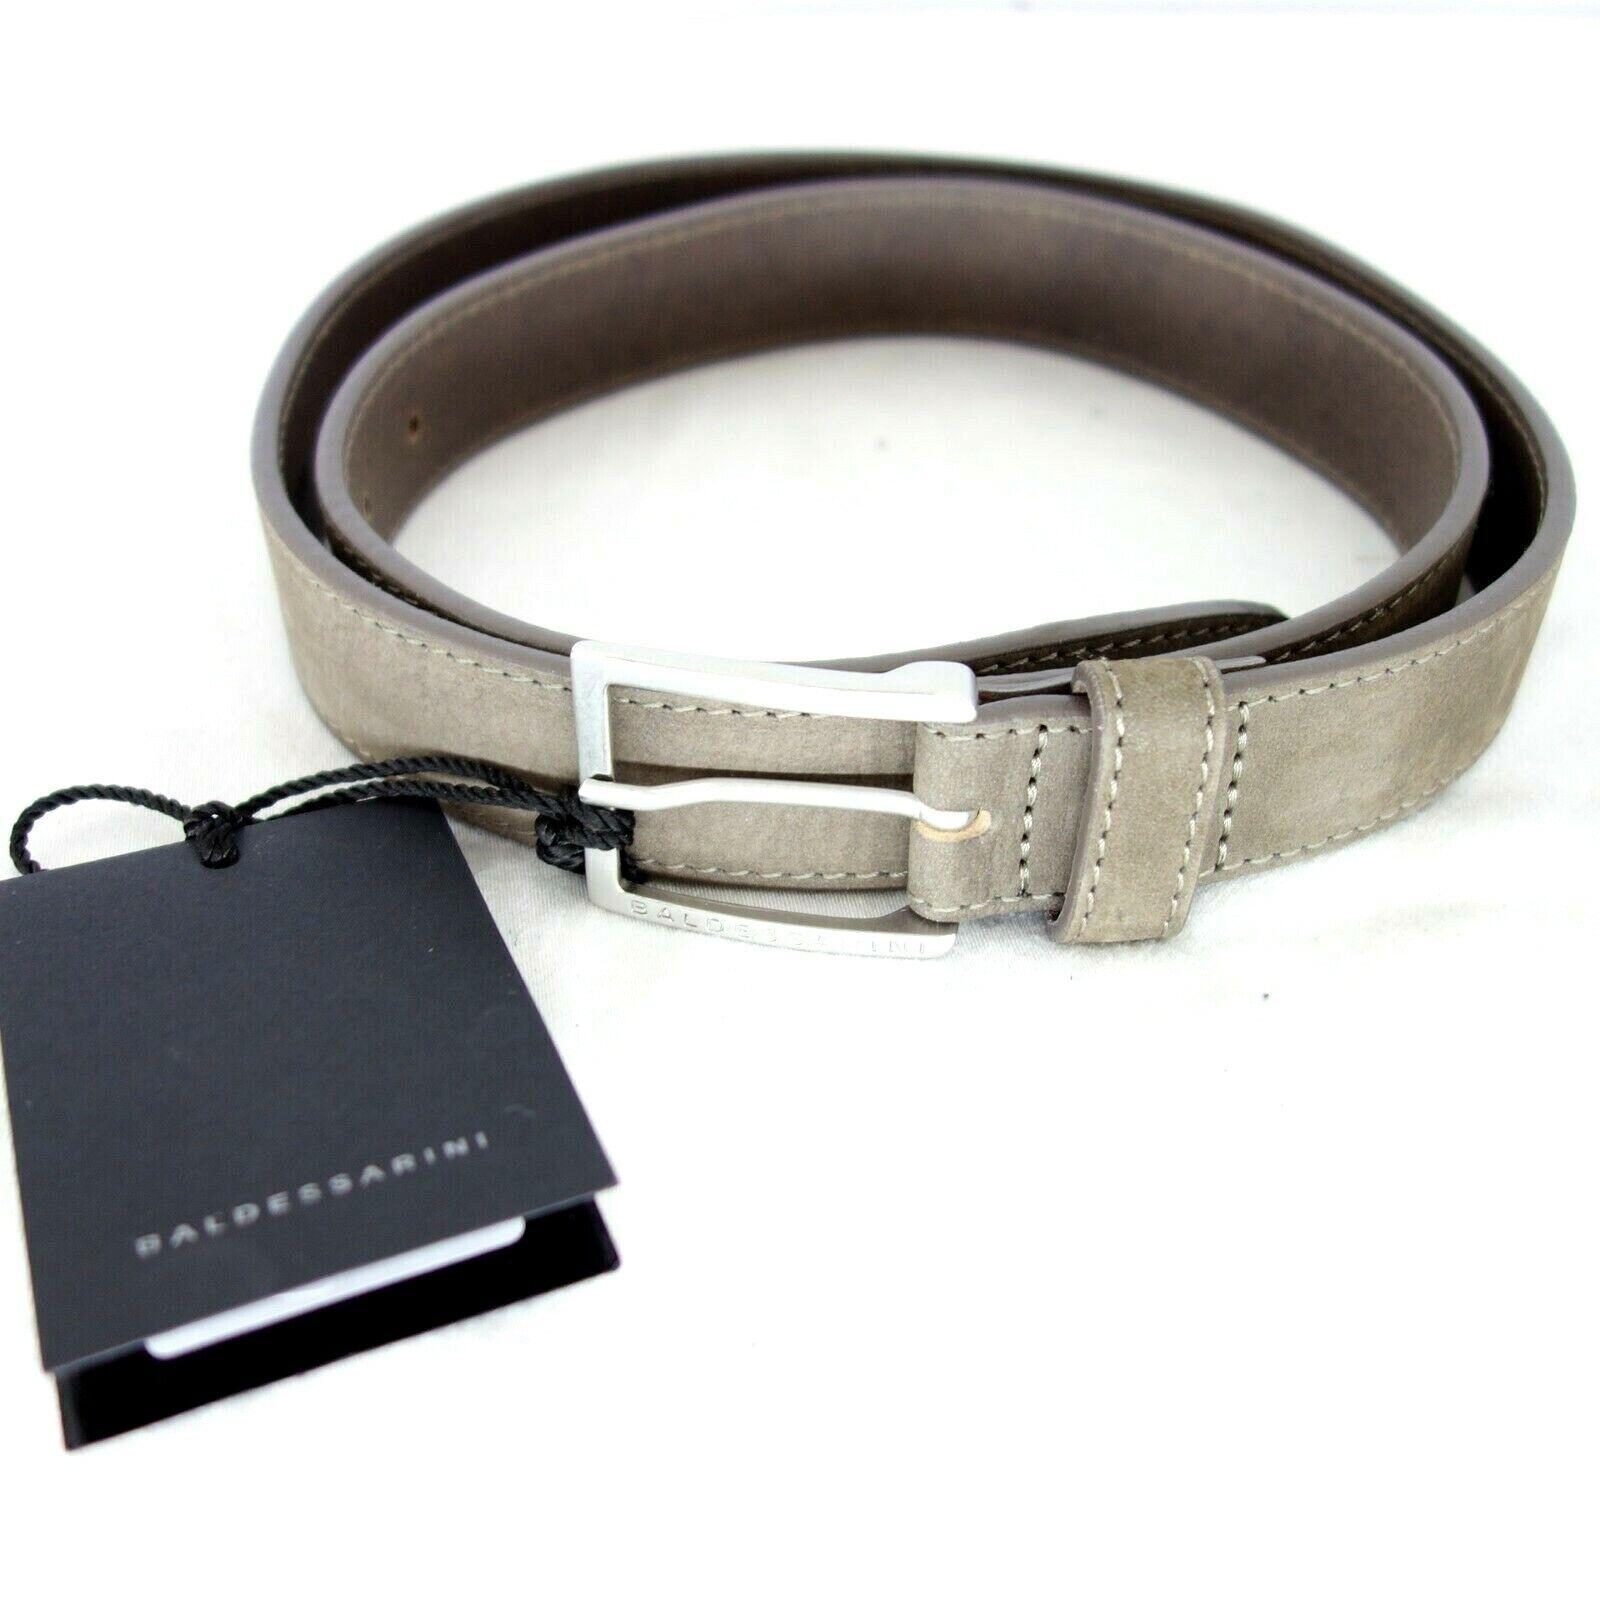 Baledessarini Mens Belt Leather Belt Size 100 Brown Leather Suede Business